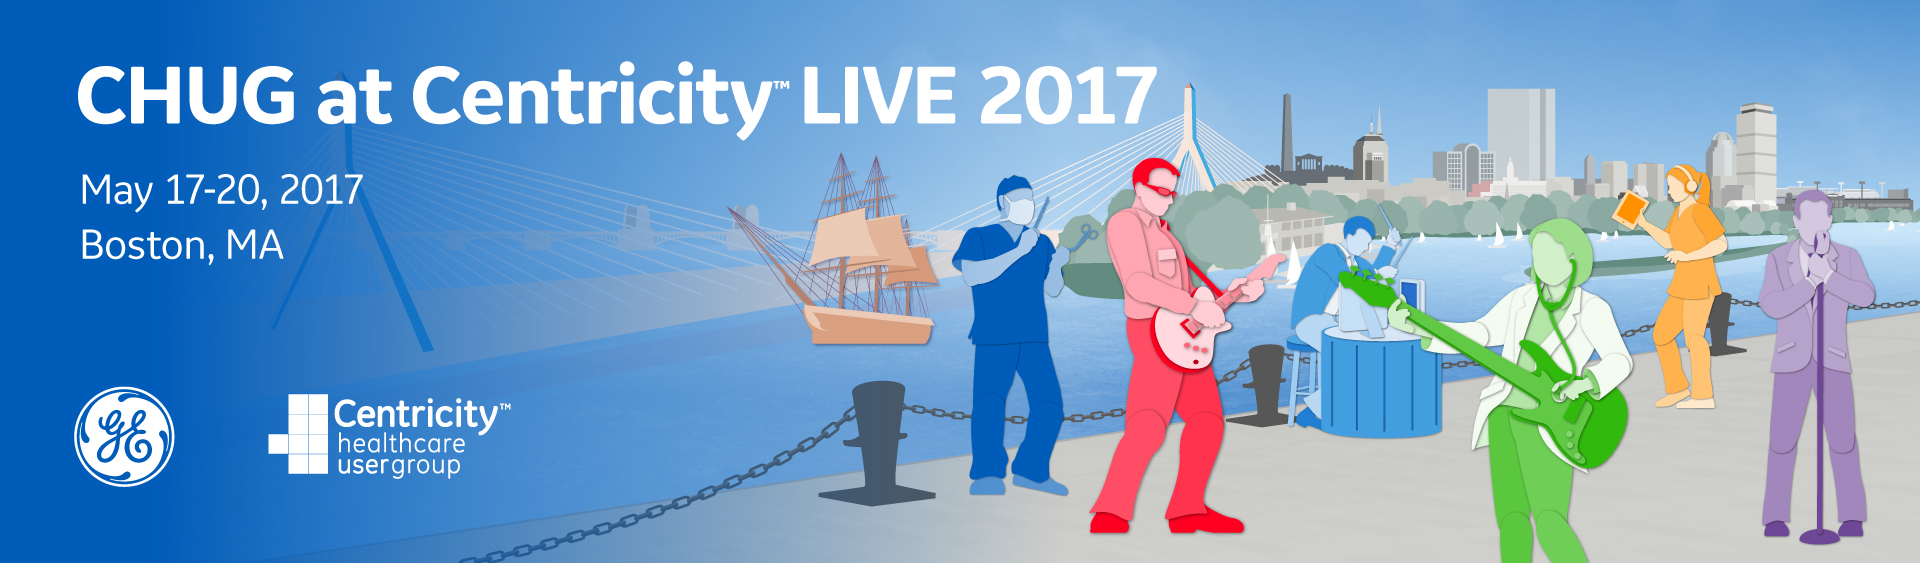 CHUG @ Centricity Live 2017